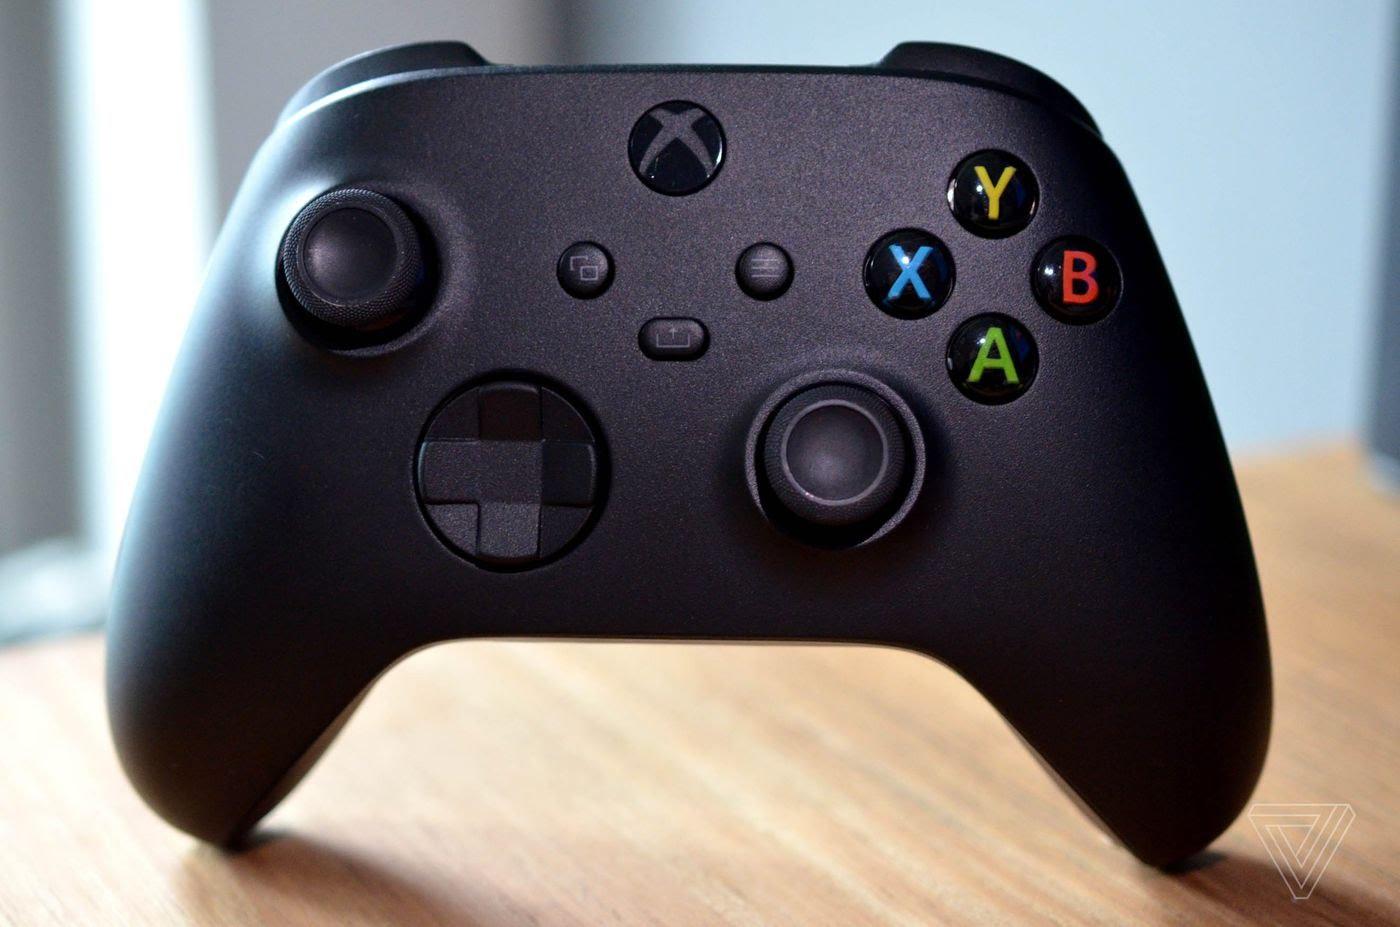 Xbox Smartphone strategy smart